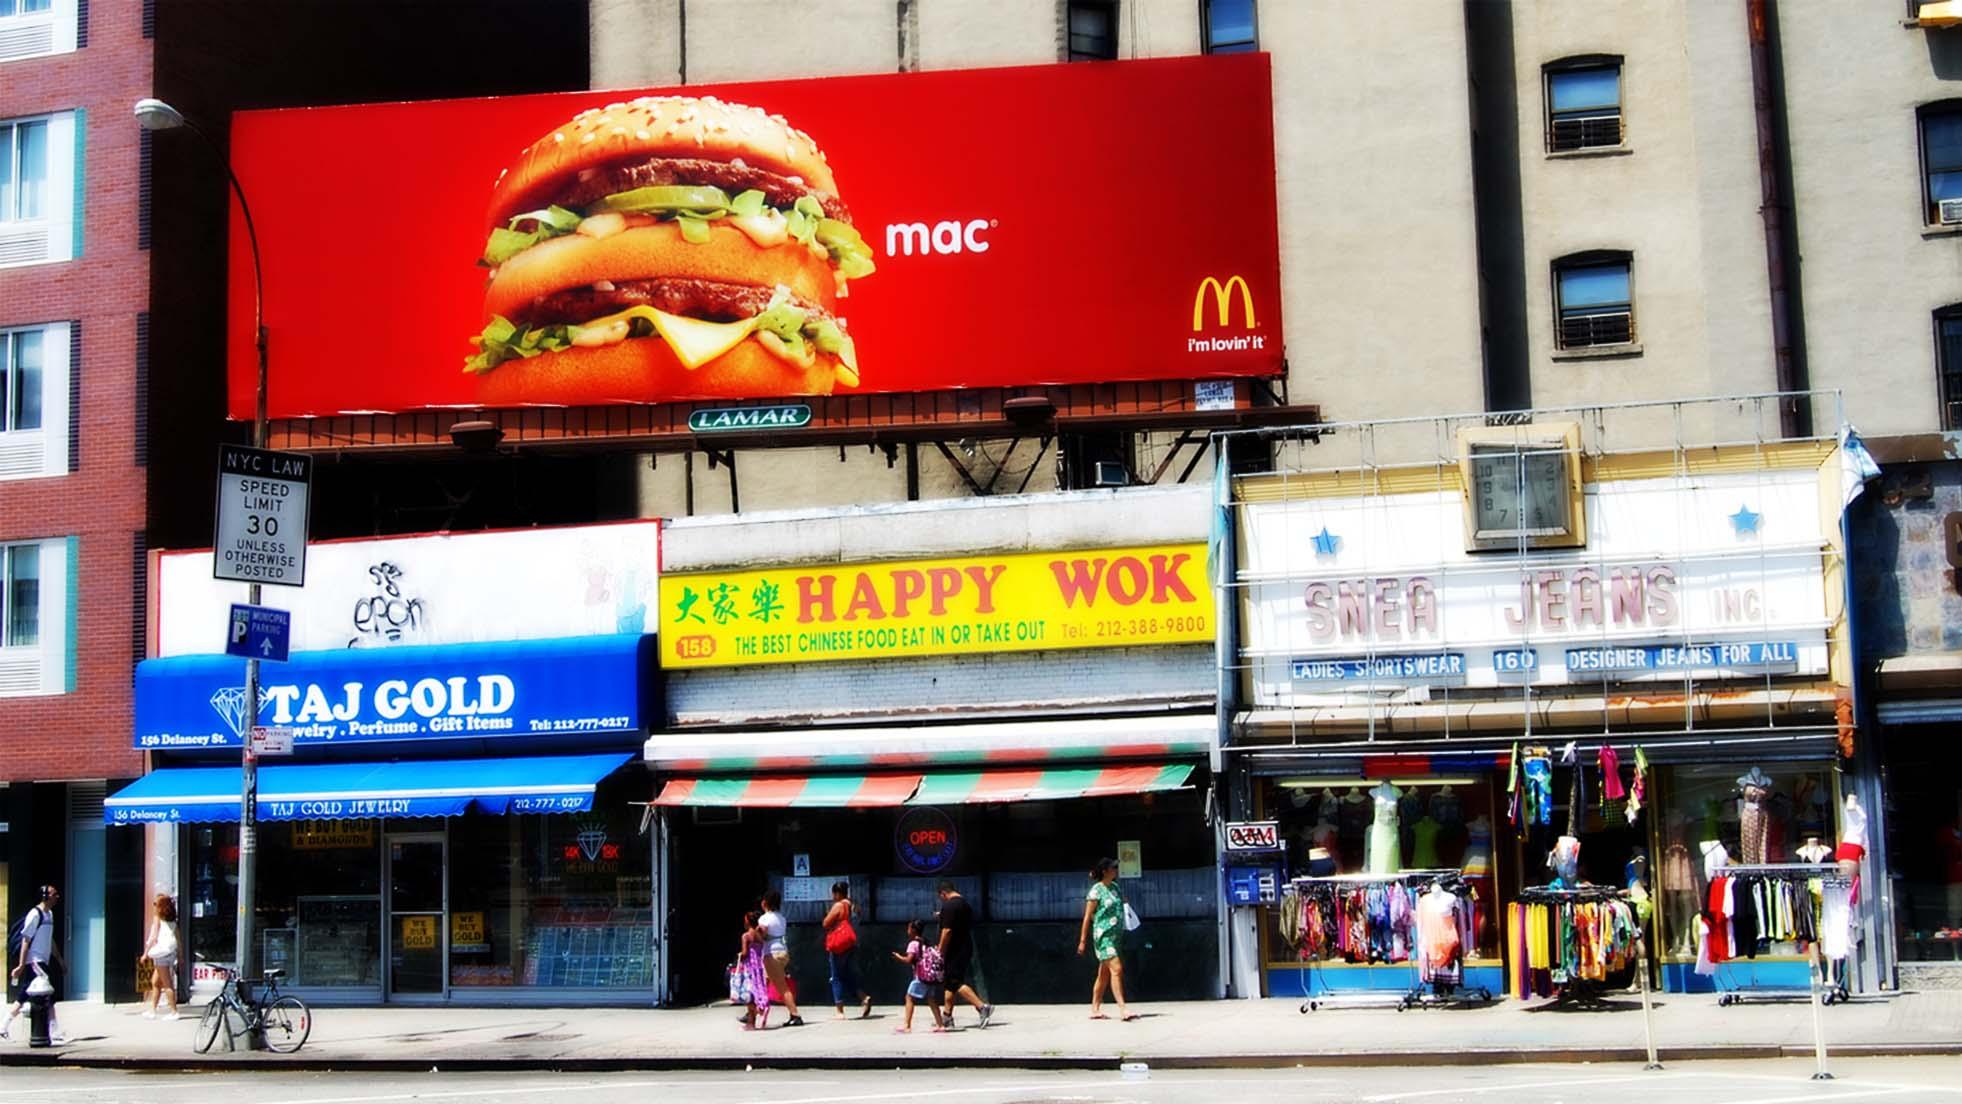 Power of Billboard Advertising